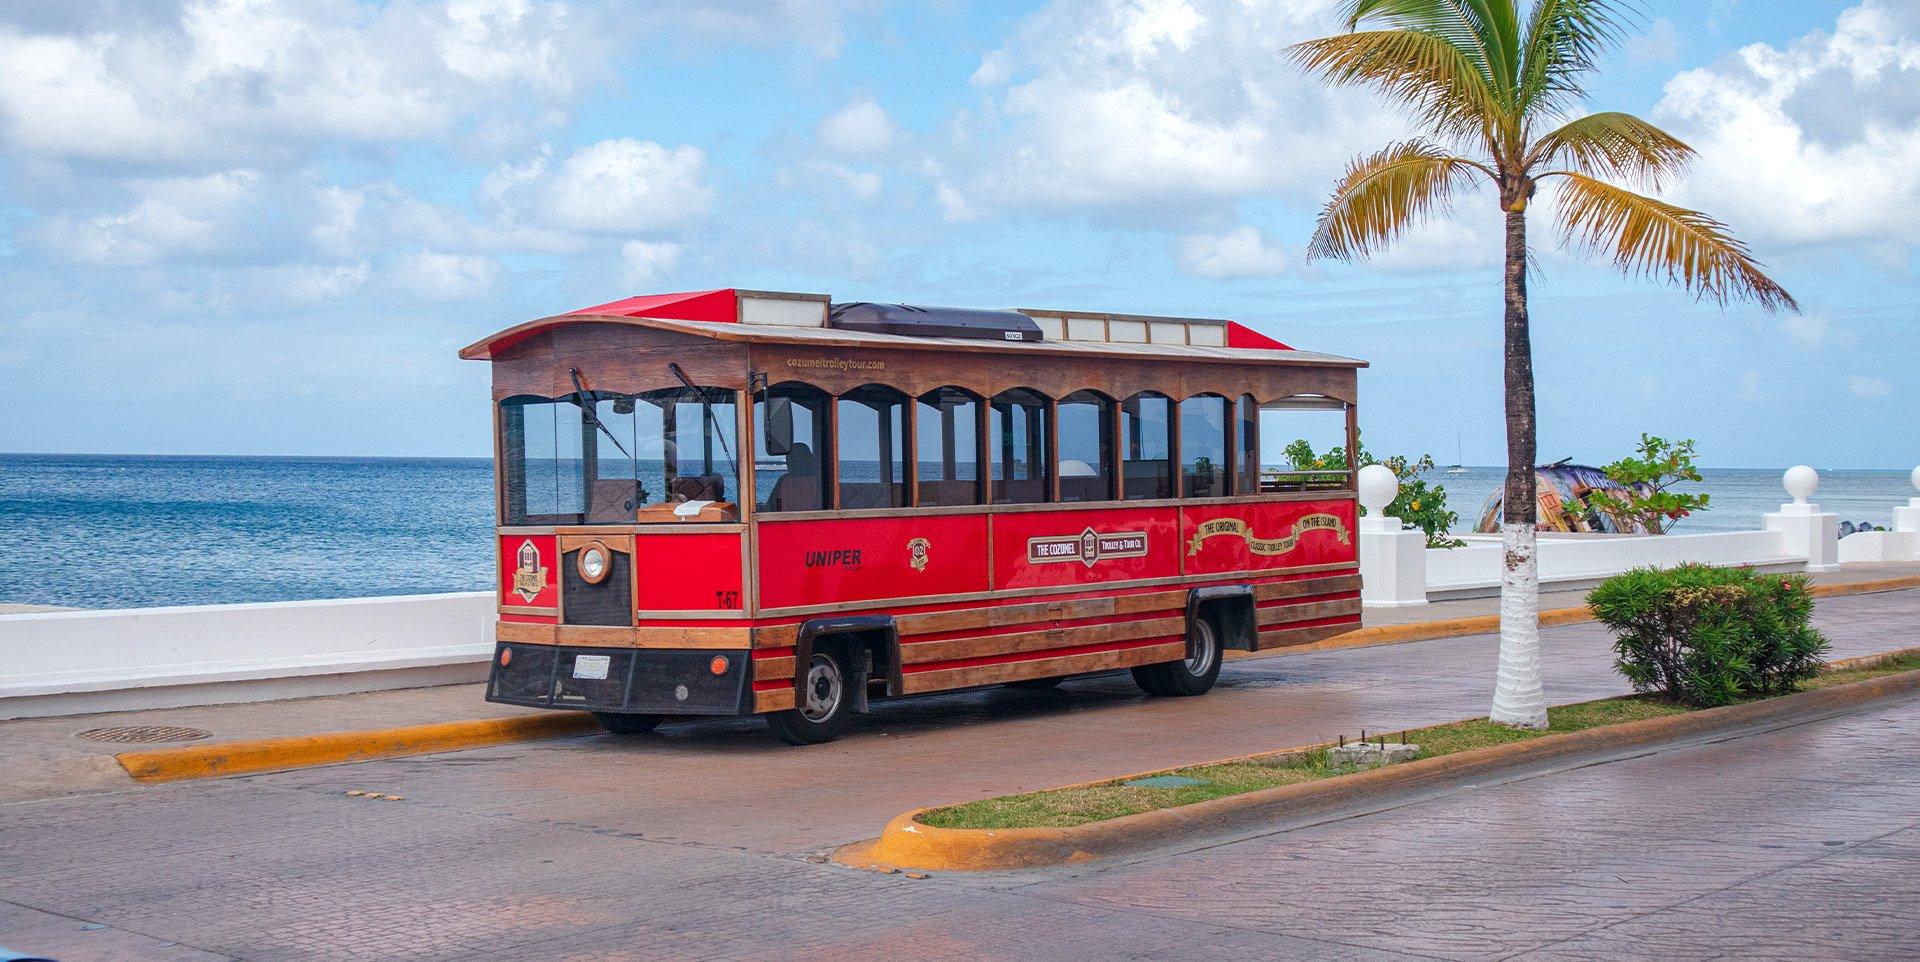 The Cozumel Trolley Tour & Co.,Cozumel,Quintana Roo